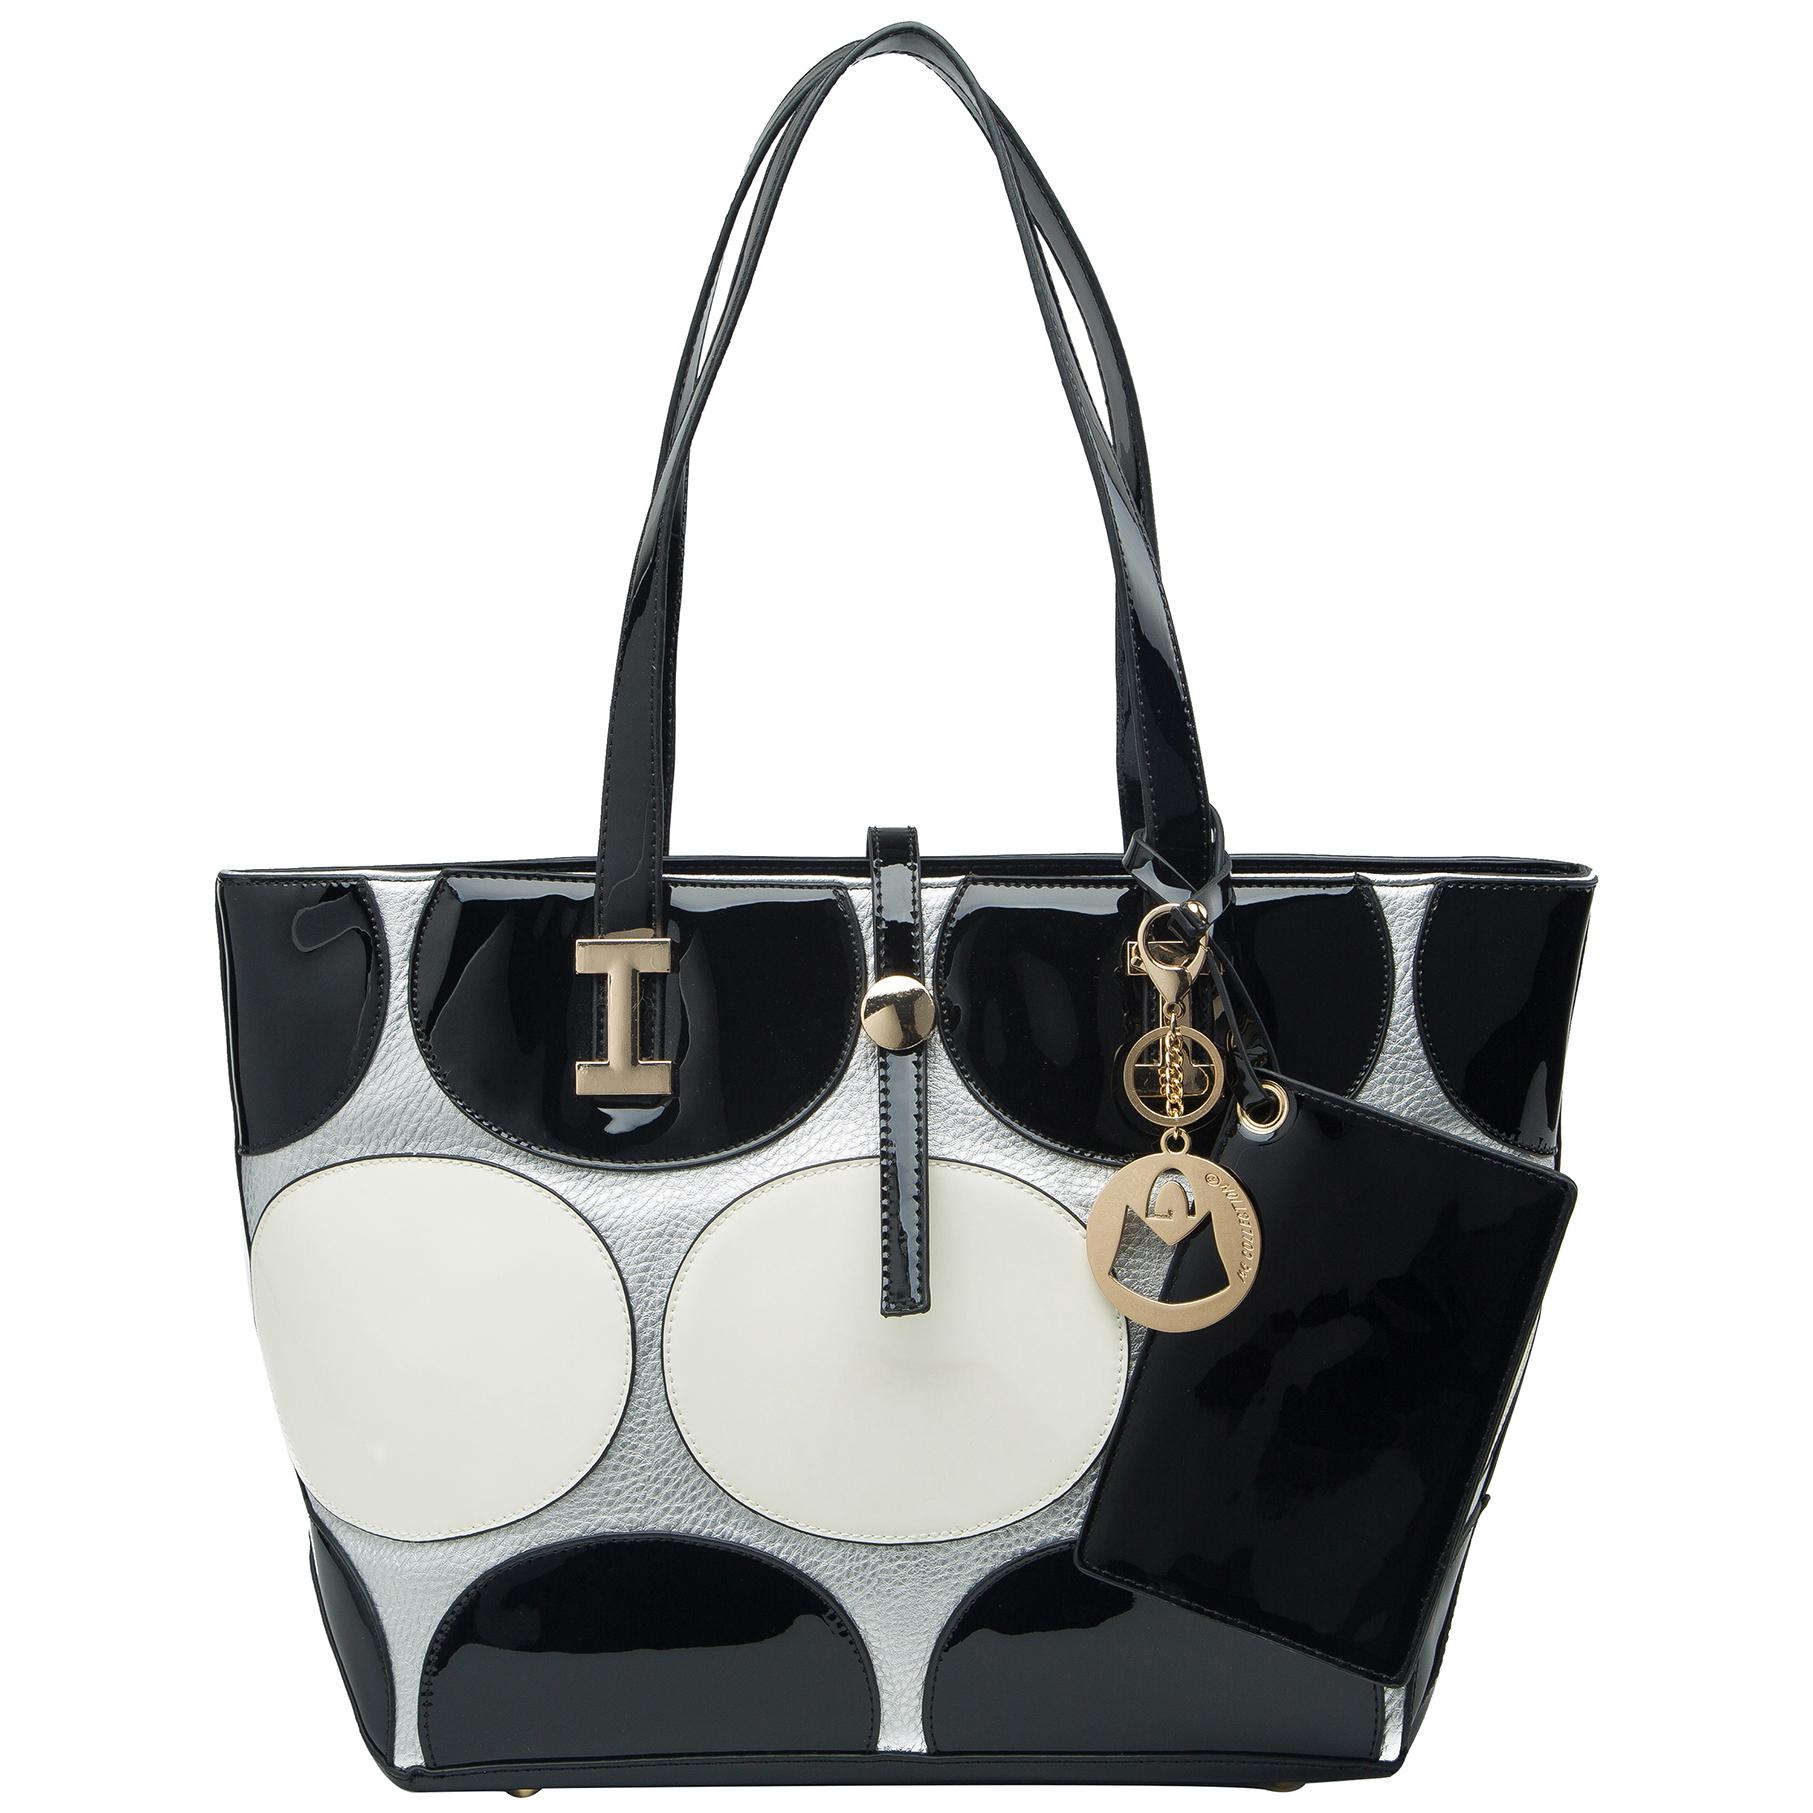 April retro leatherette top handle designer handbag front image